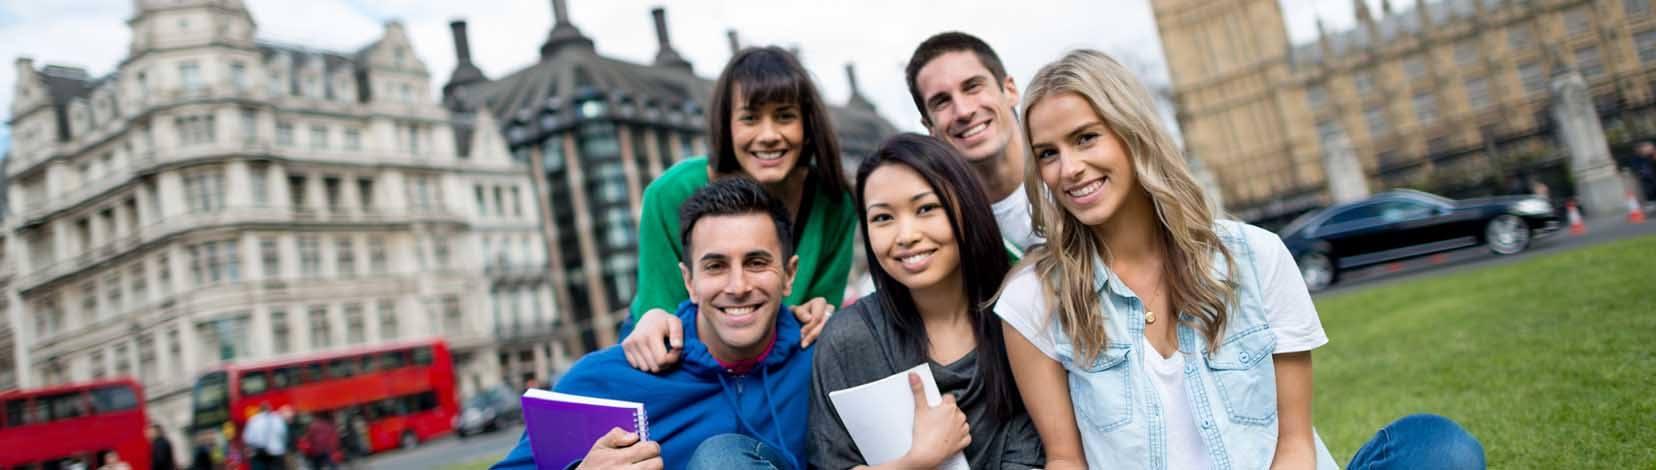 Grupo de estudiantes en Londres